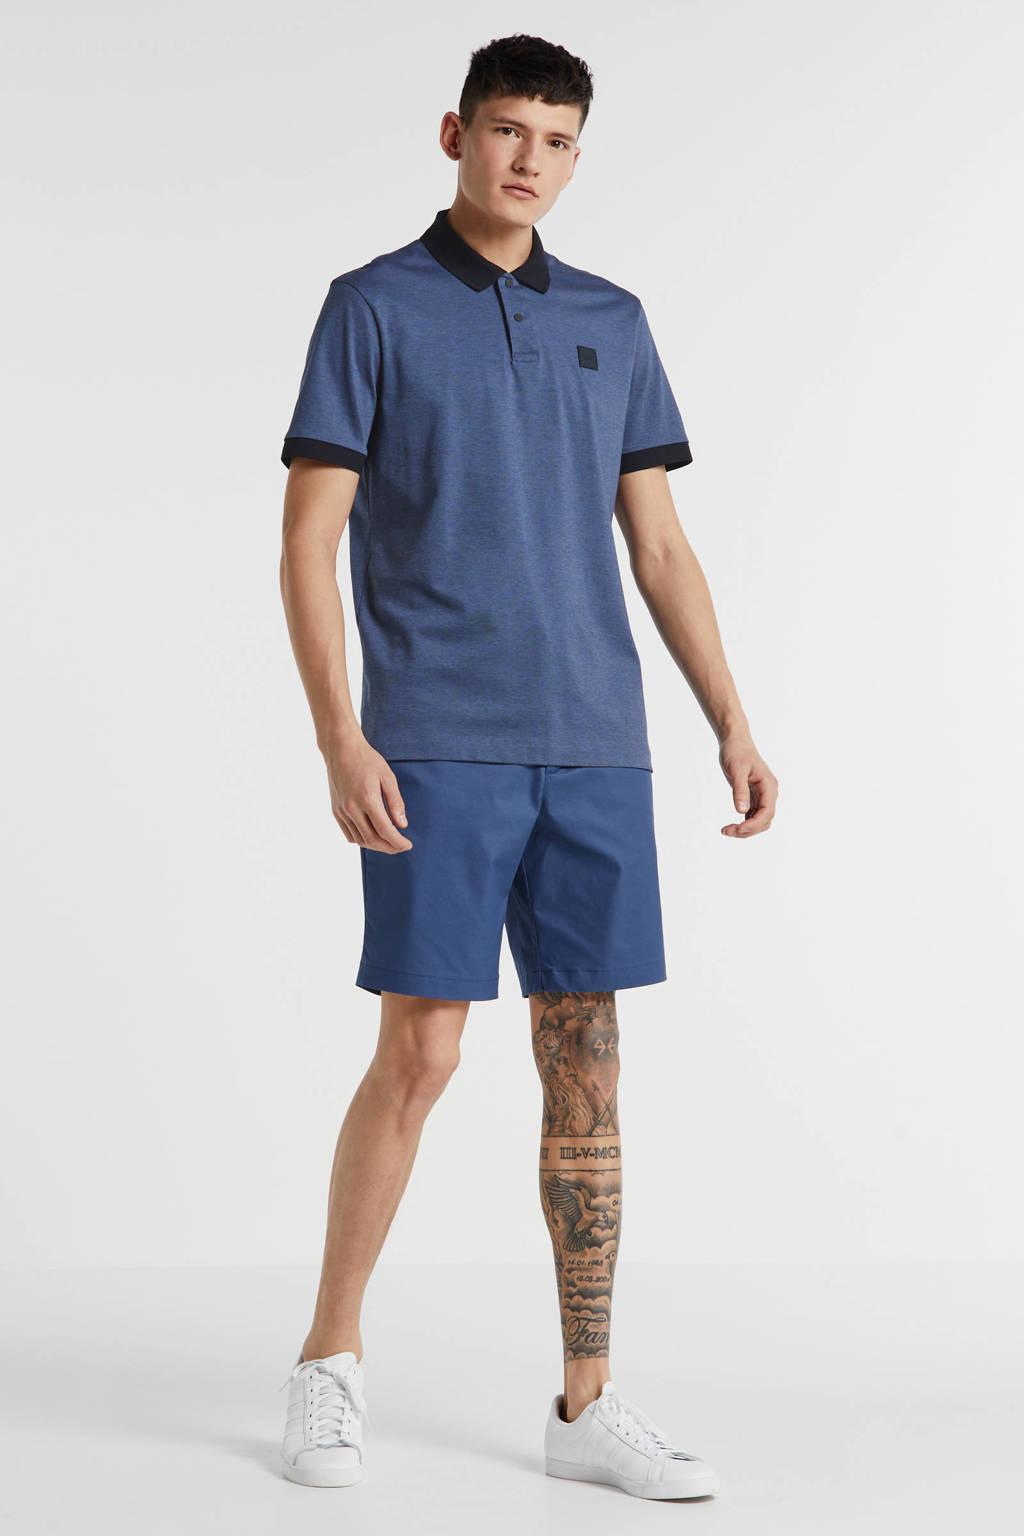 BOSS Menswear regular fit polo donkerblauw, Donkerblauw